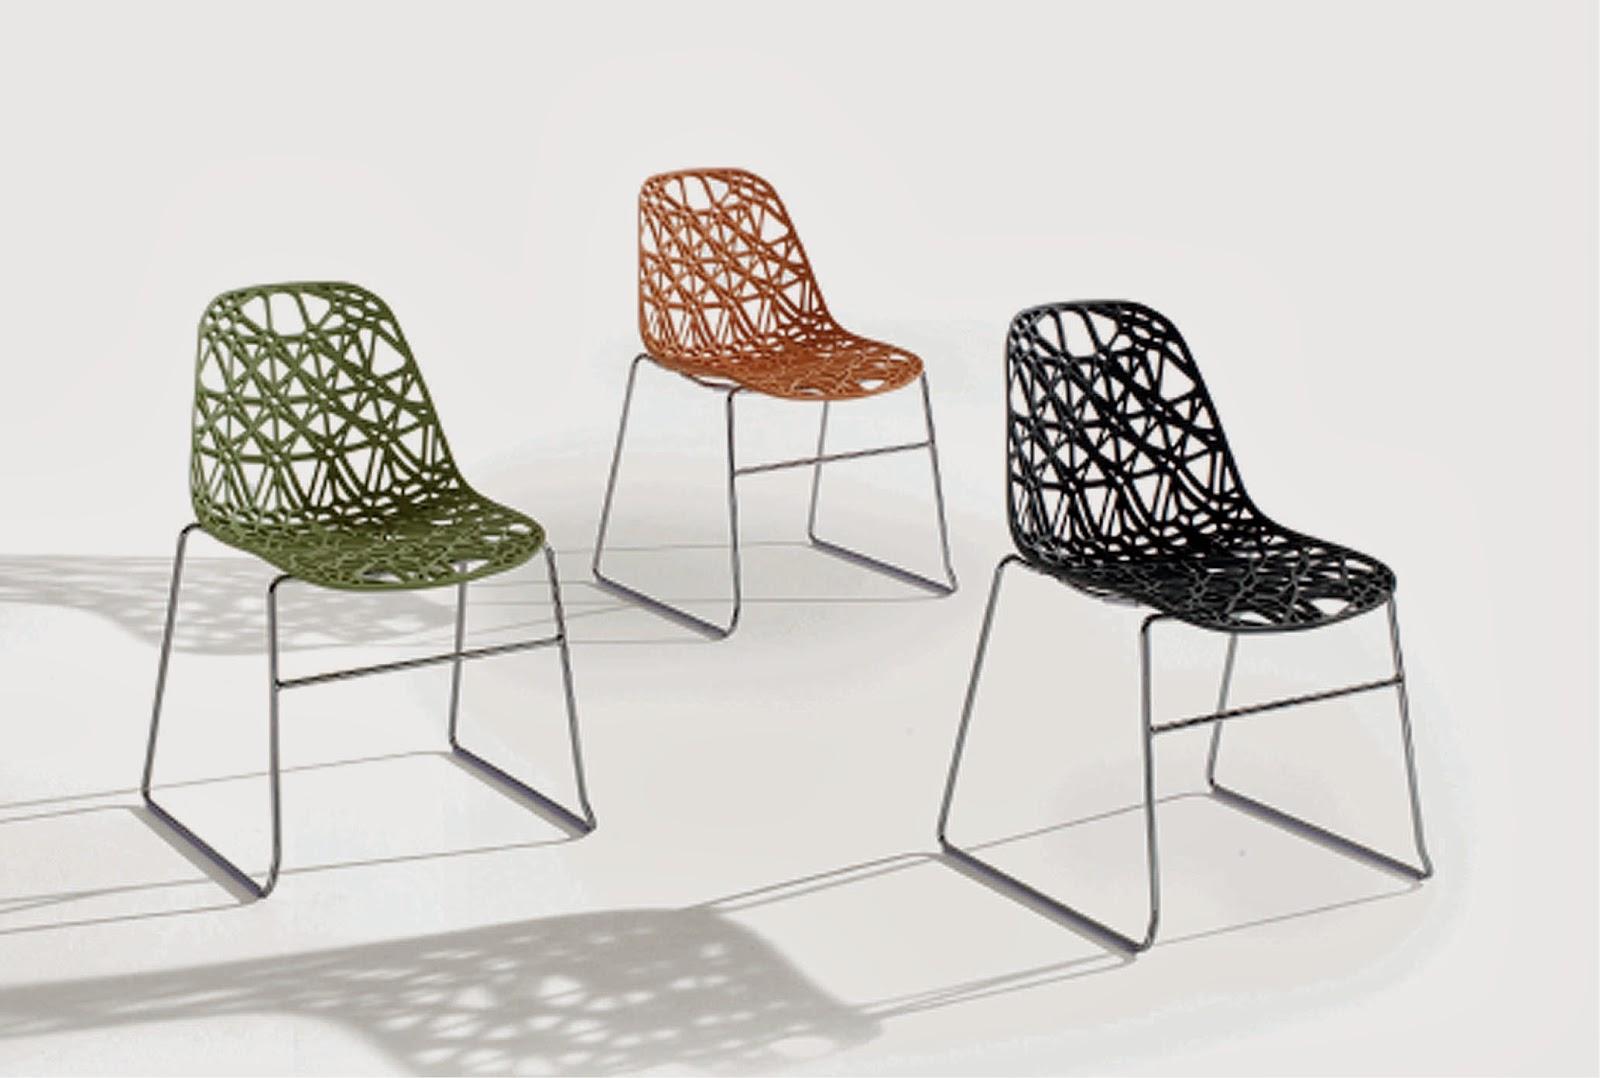 Nett colecci n dise o tafesa sillas y mesas met licas for Sillas metalicas